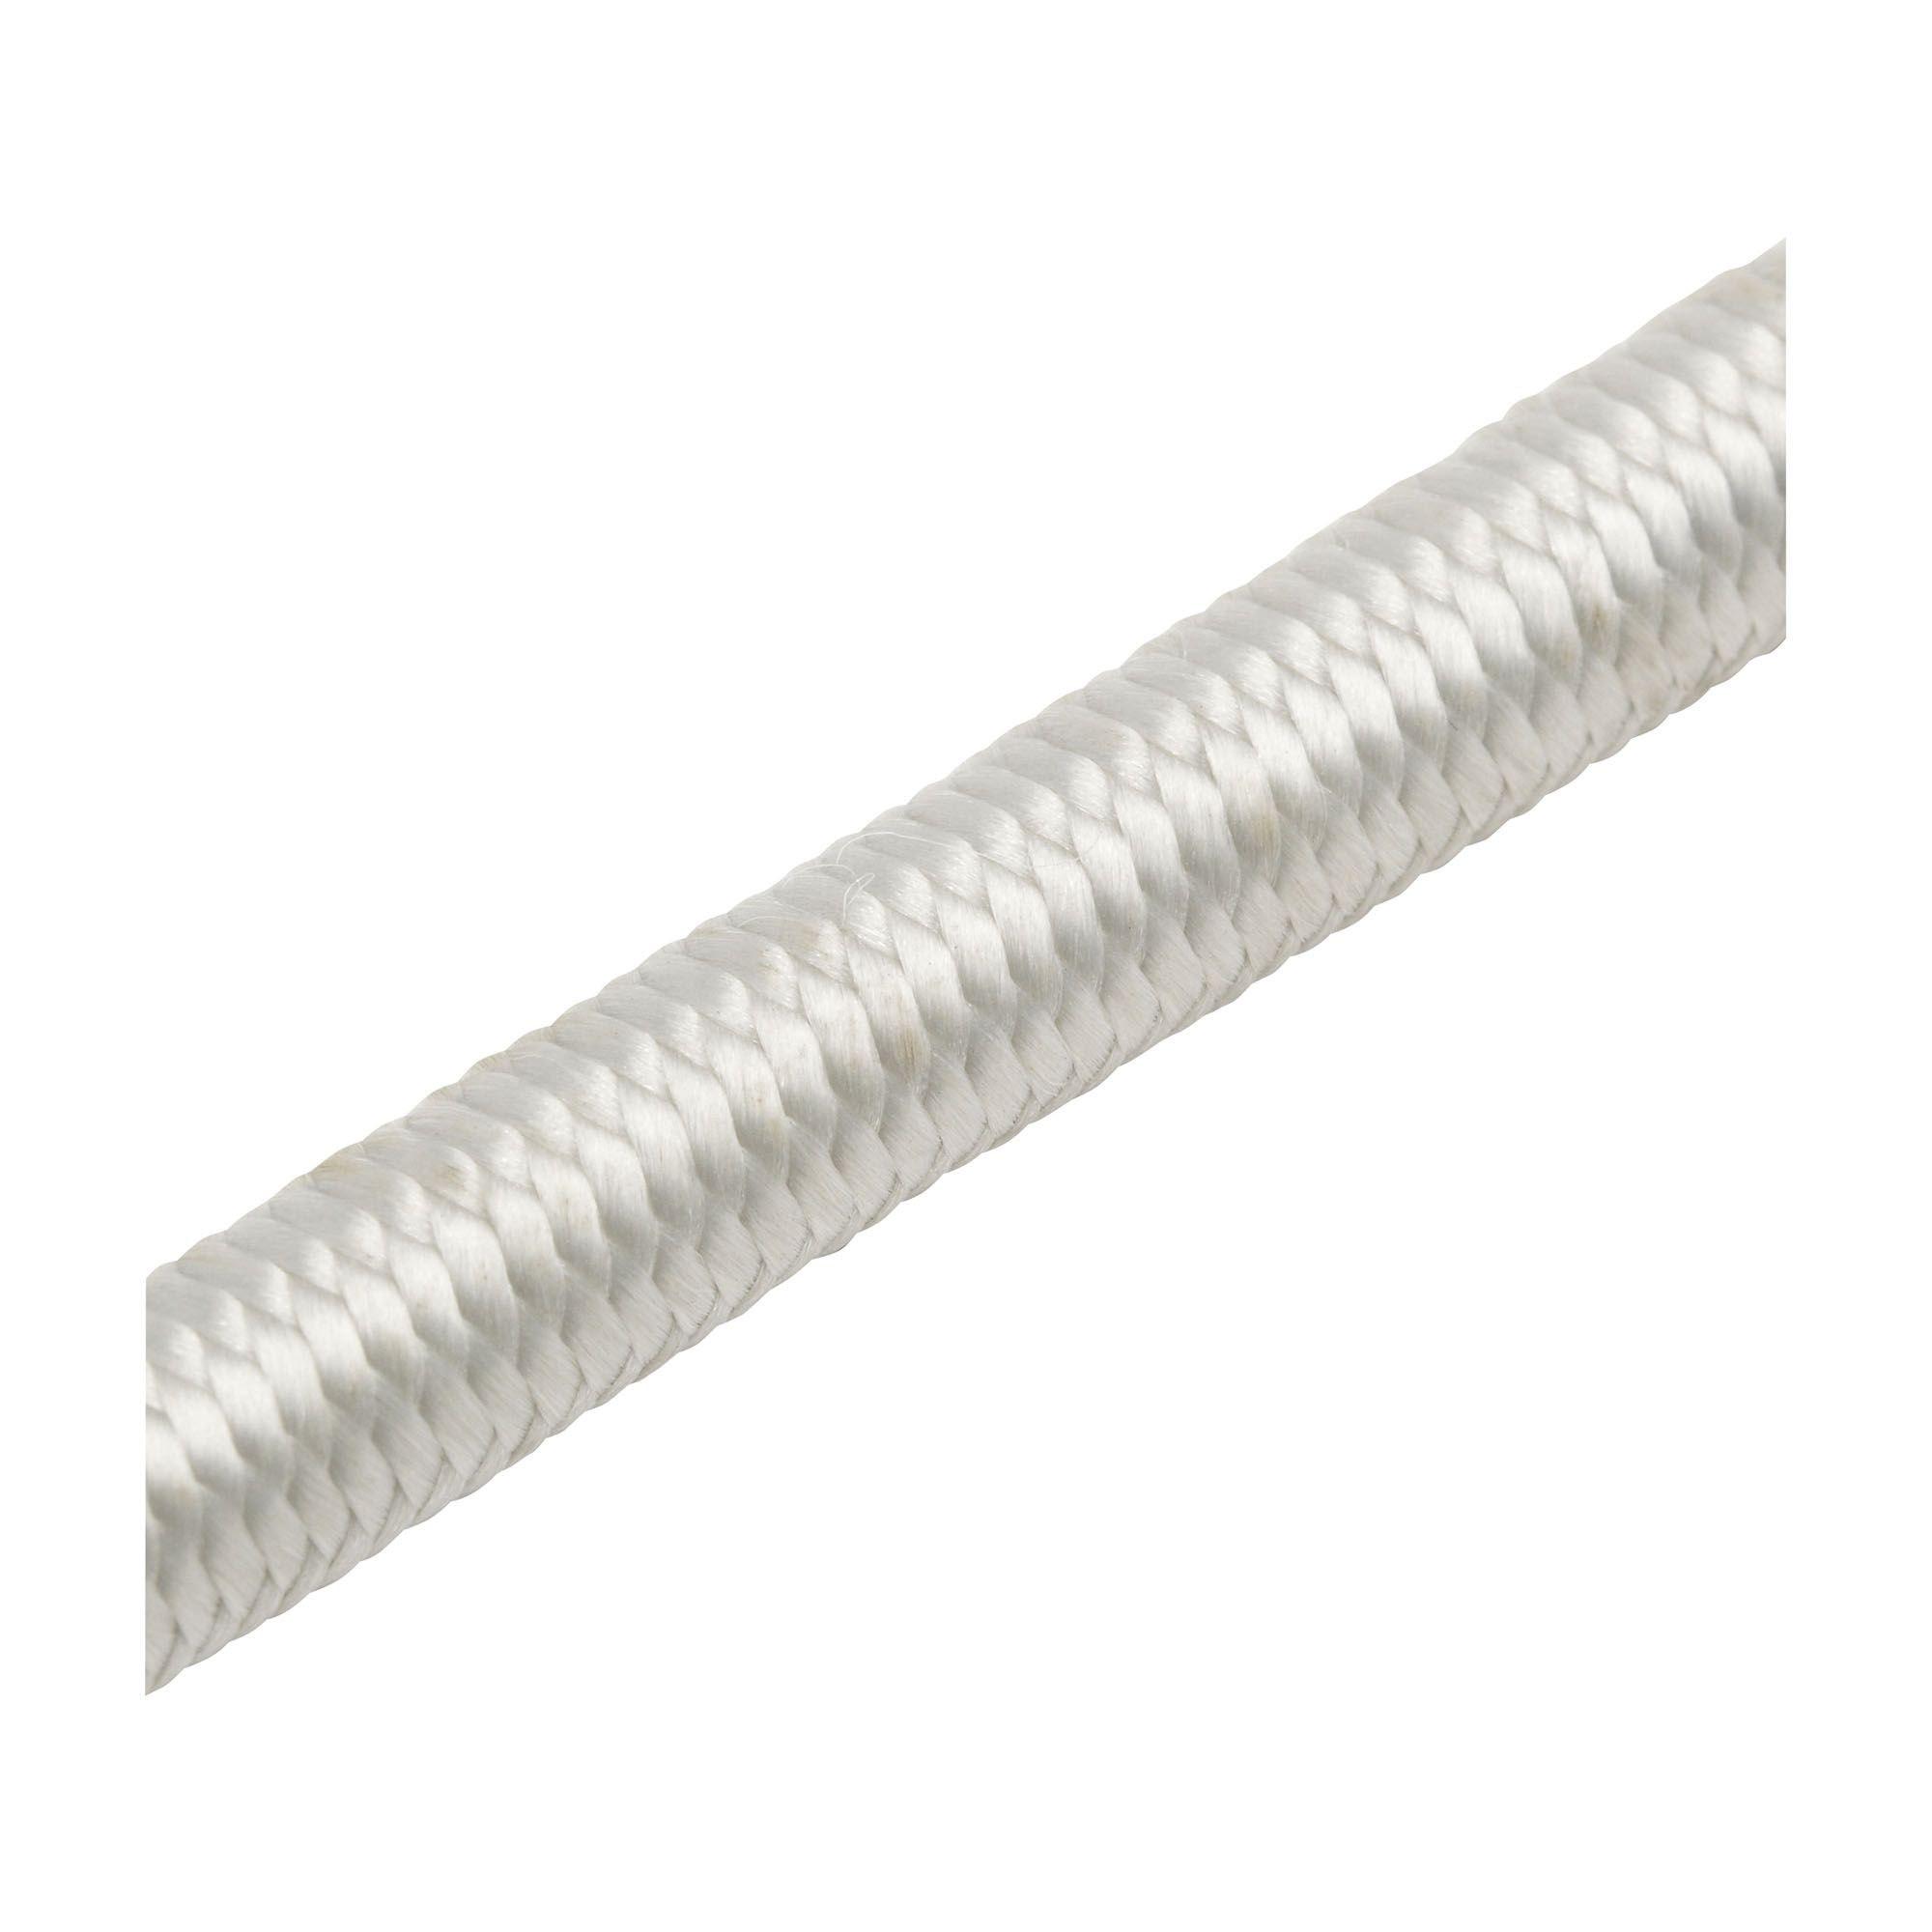 Coarda elastica 10 mm 50 m 38 kg vrac